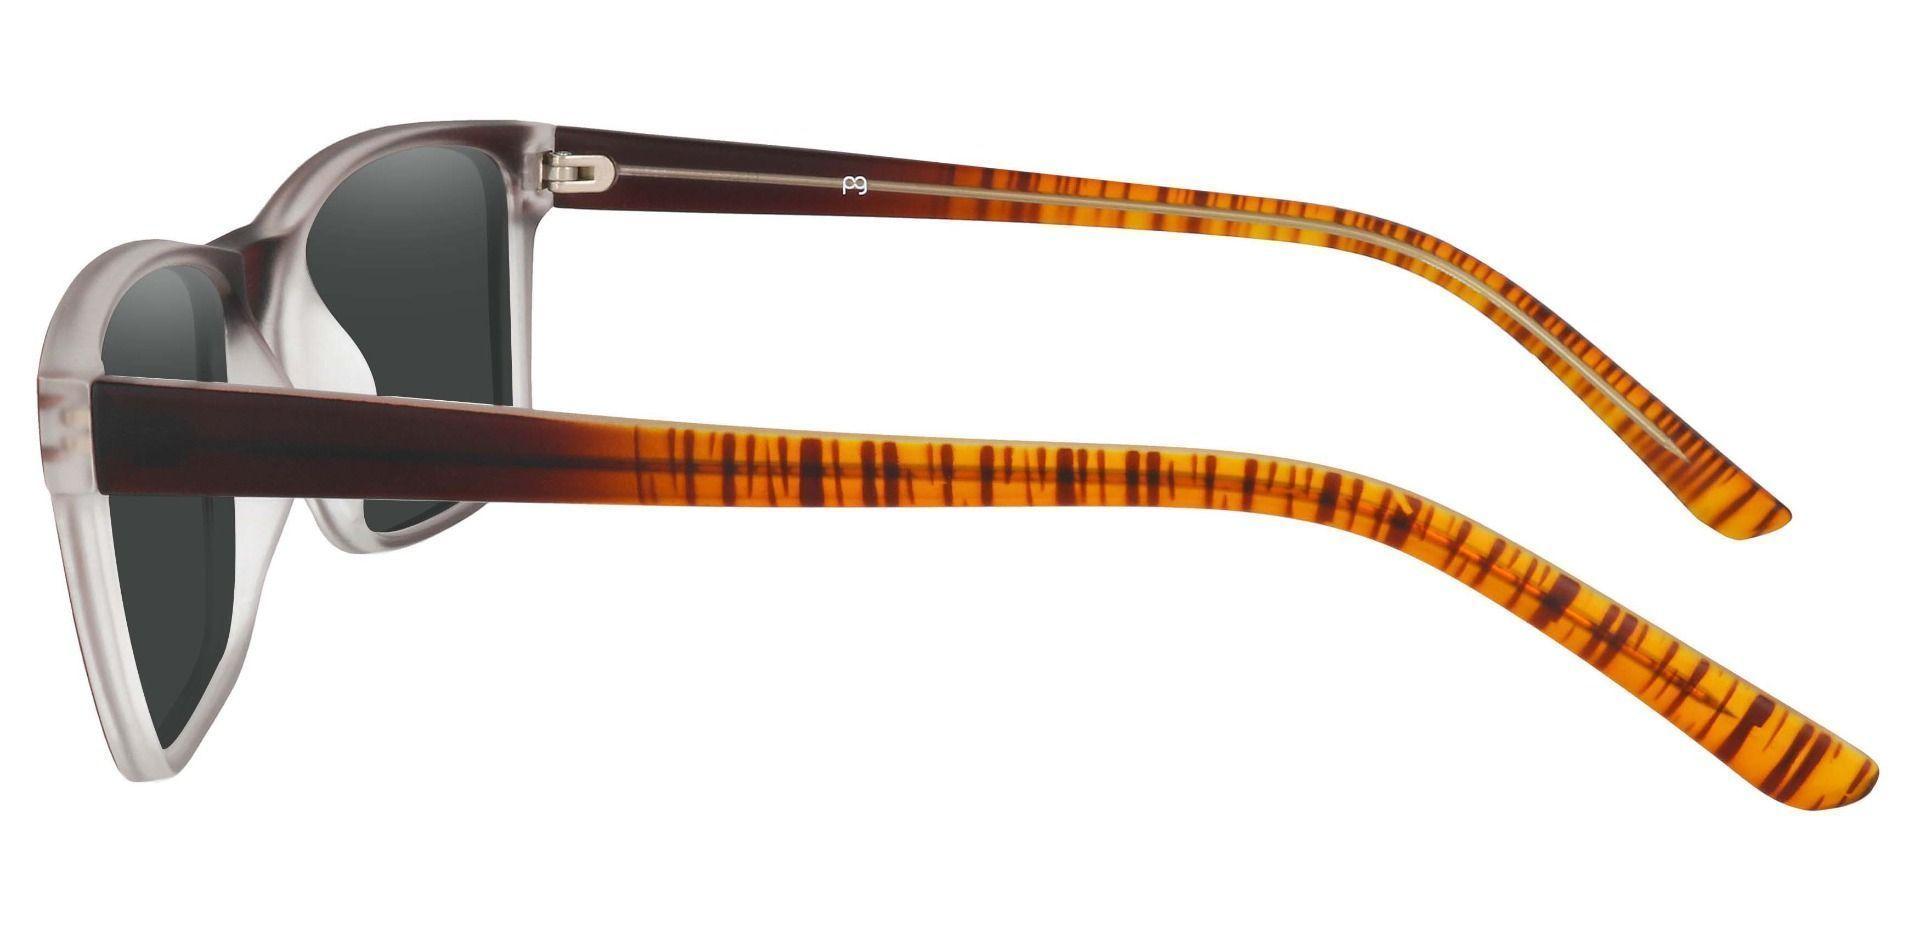 Royal Rectangle Prescription Sunglasses - Brown Frame With Gray Lenses